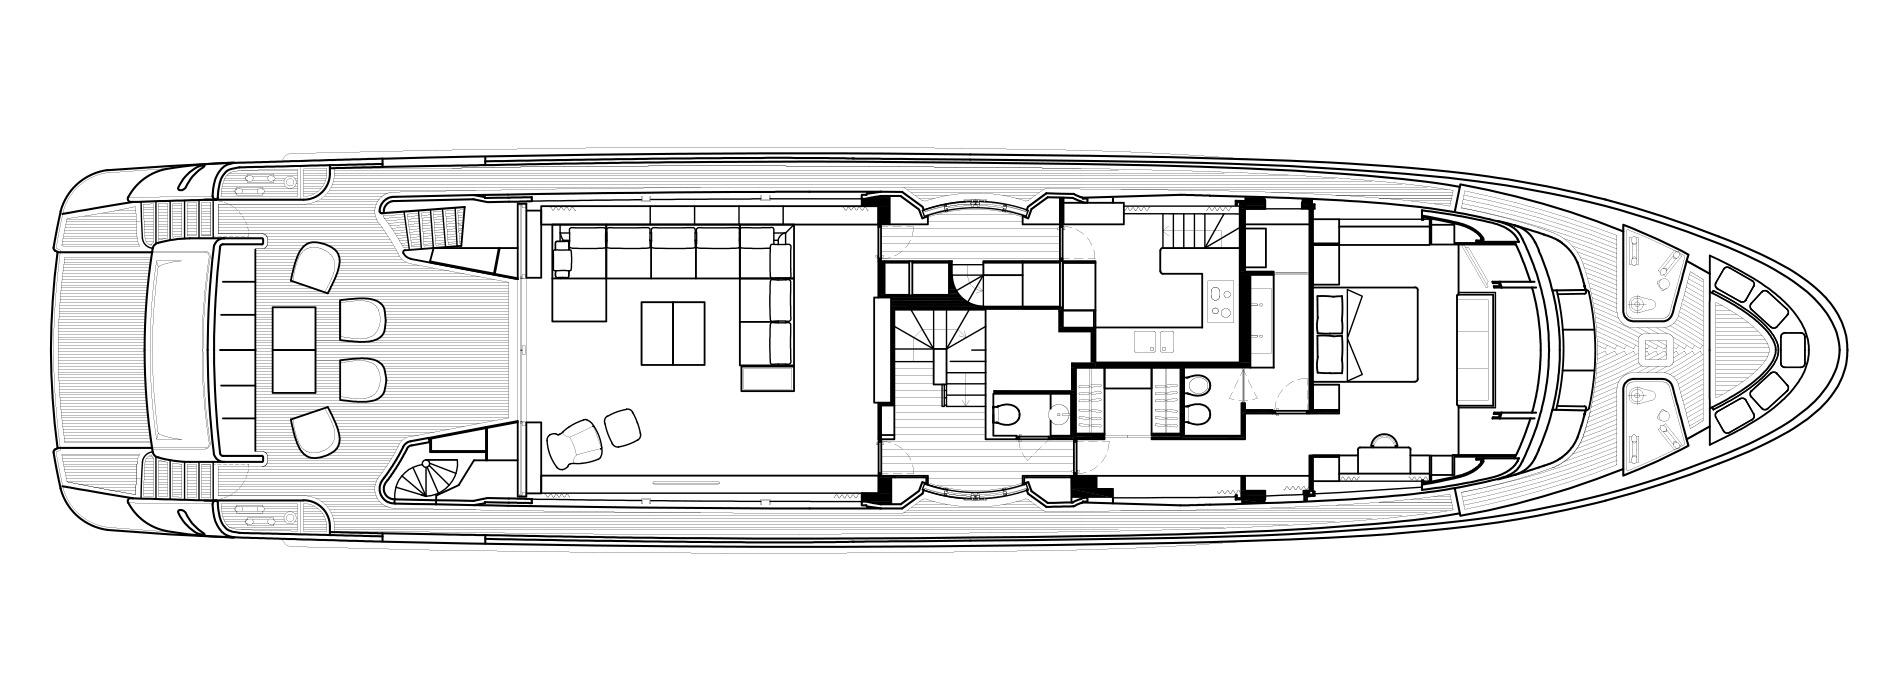 Sanlorenzo Yachts SD112 Главная палуба версия B